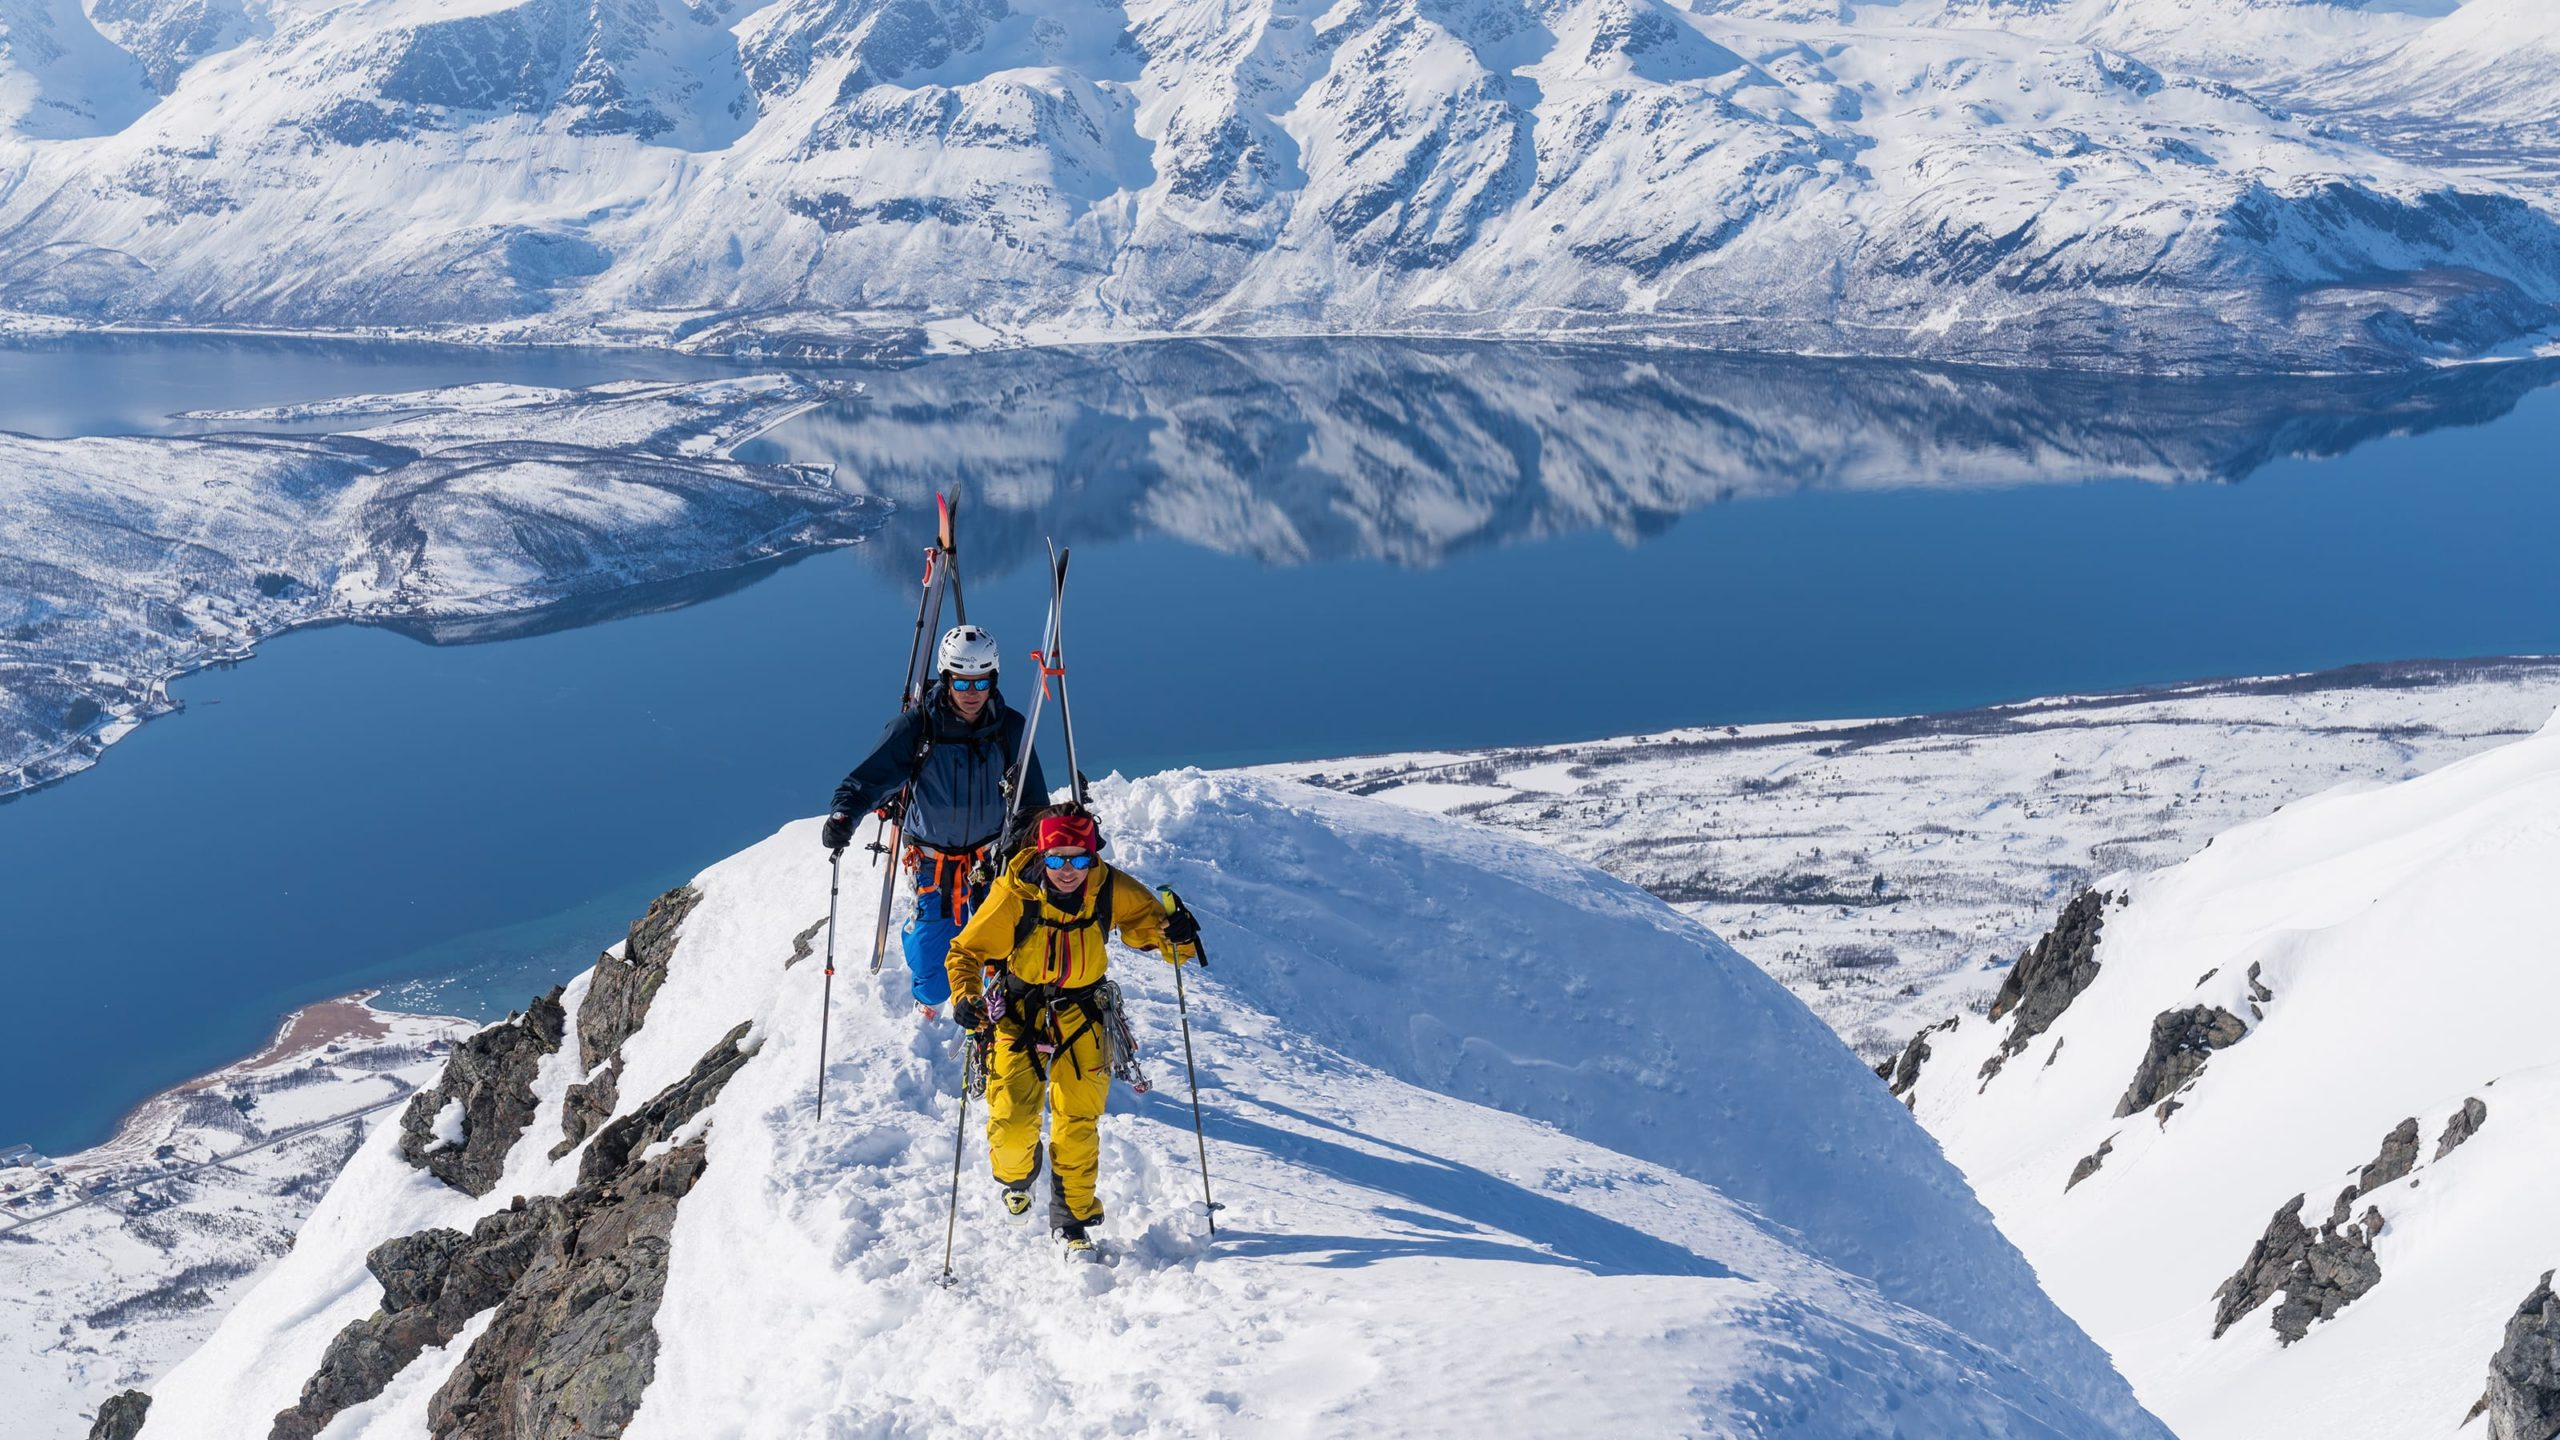 Merrick Mordal ski touring